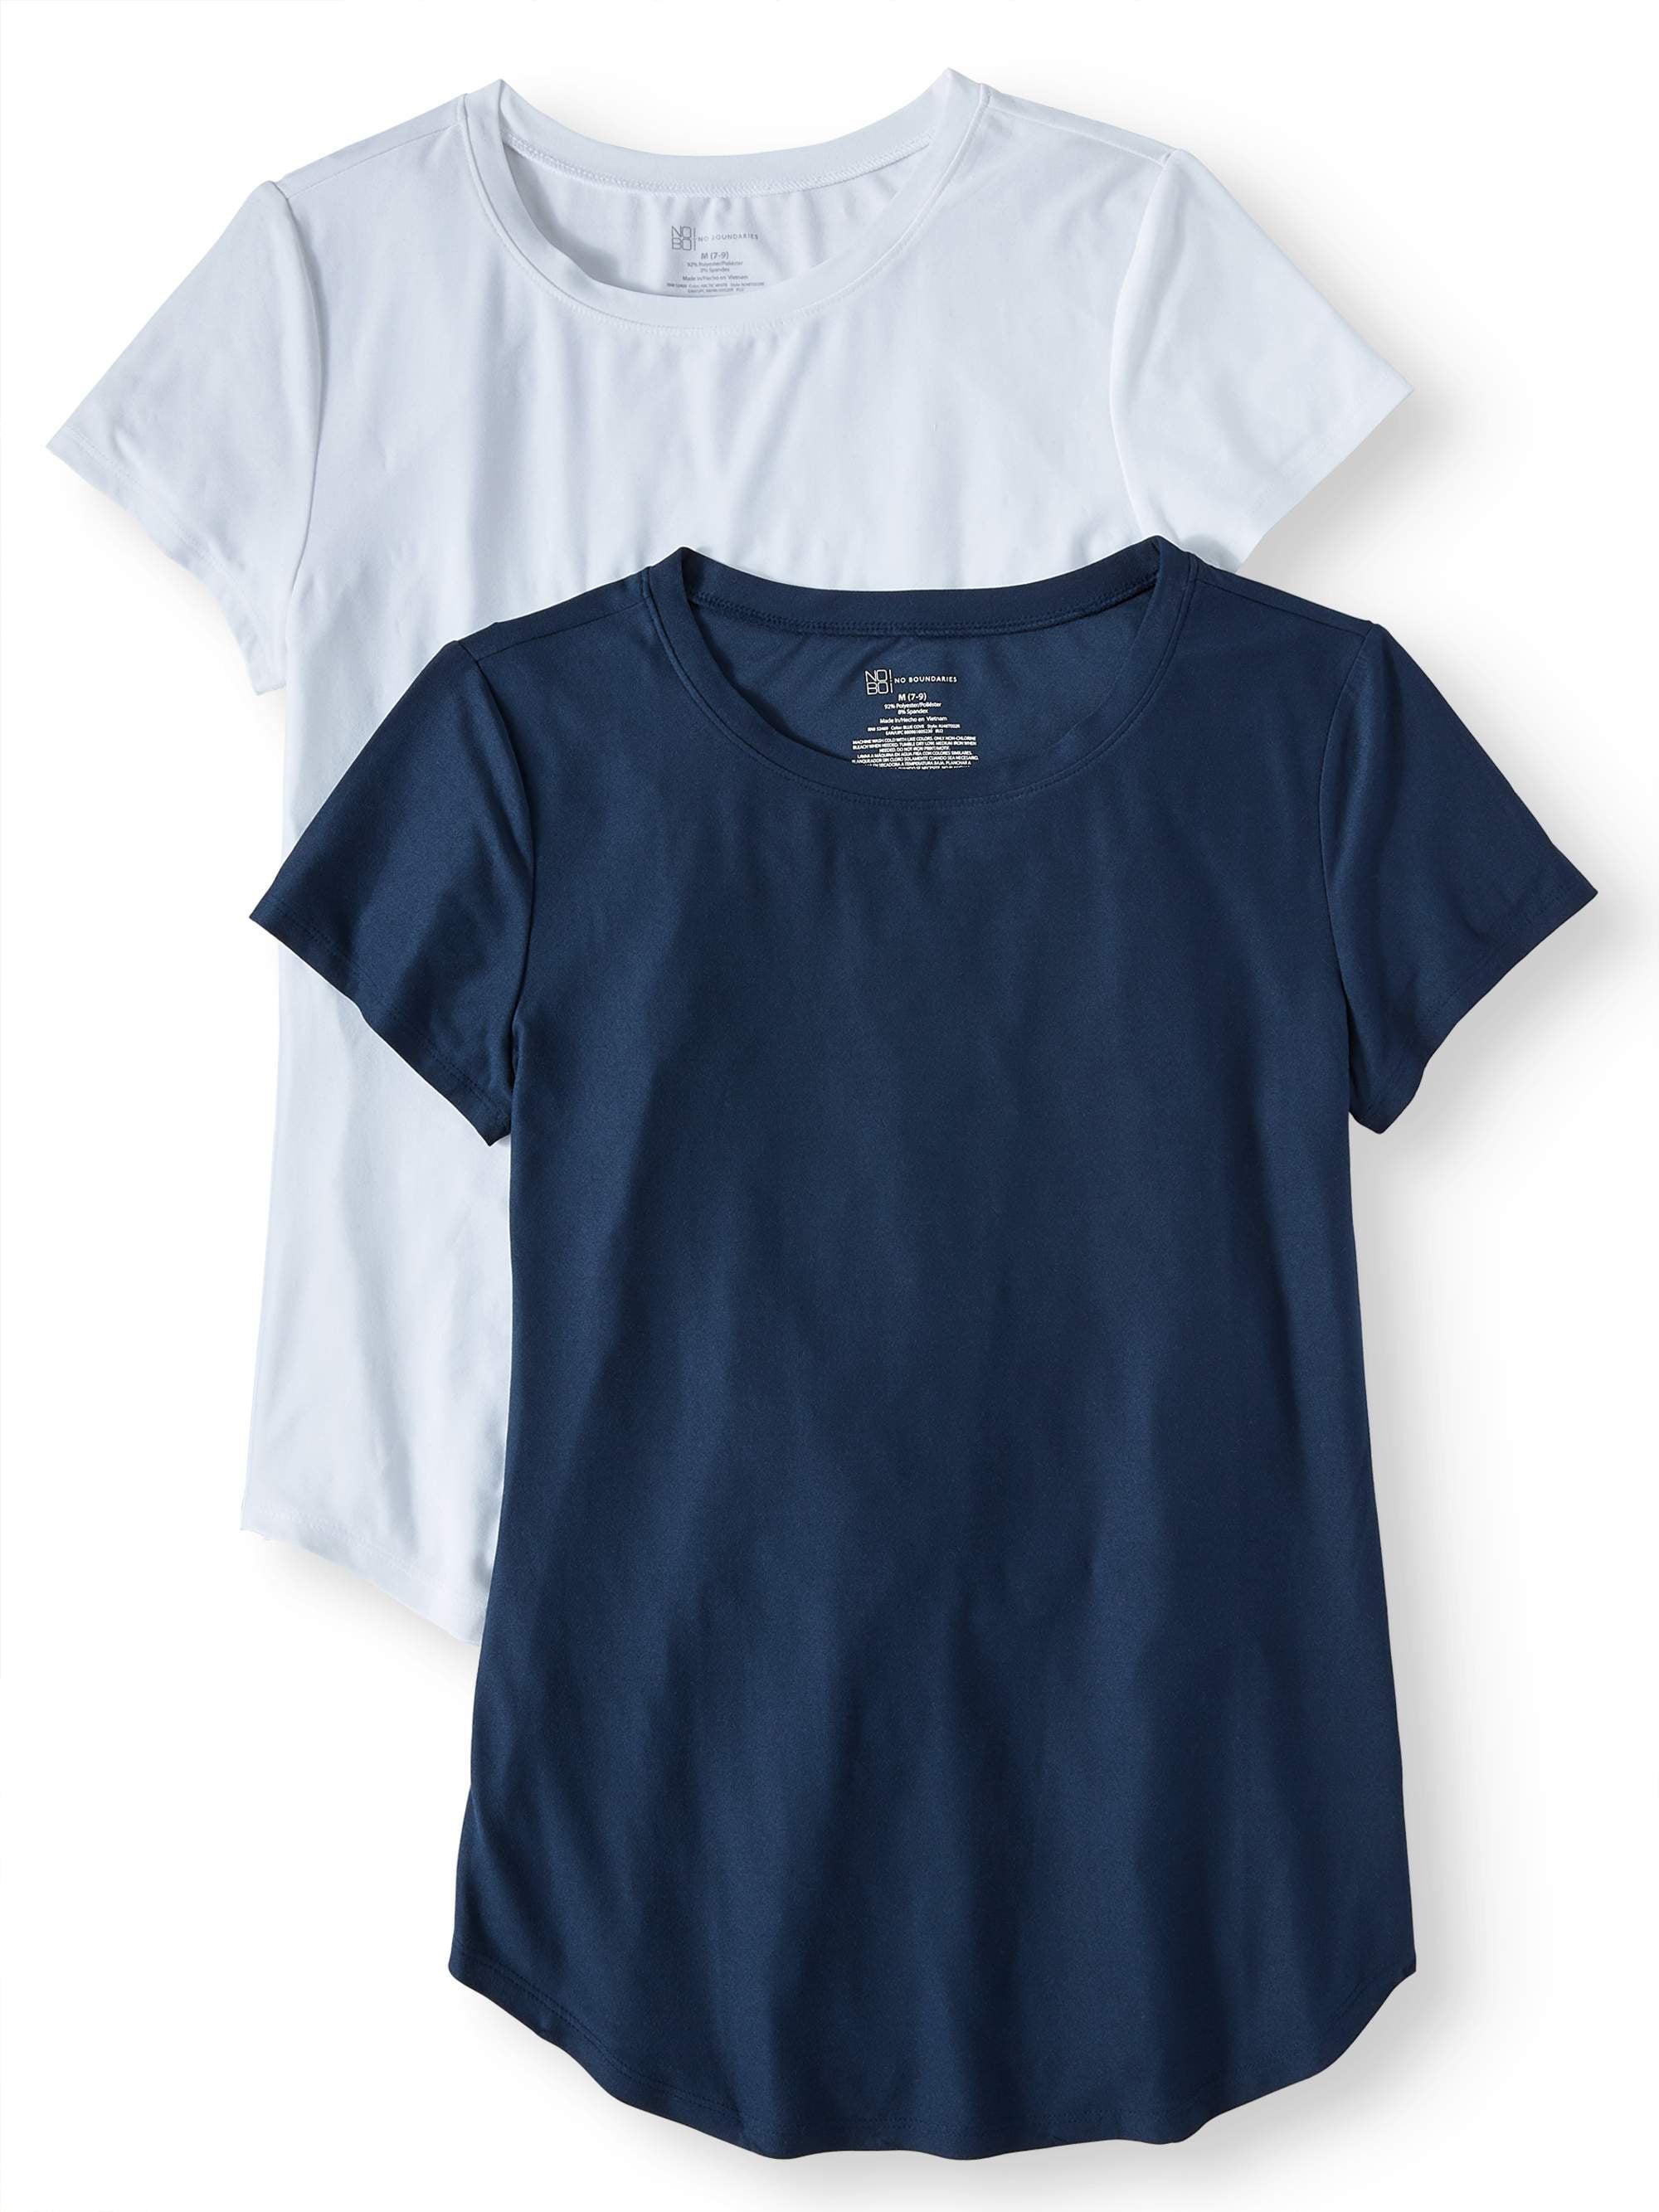 Juniors' Brushed Short Sleeve Round Neck T-Shirt 2-Pack